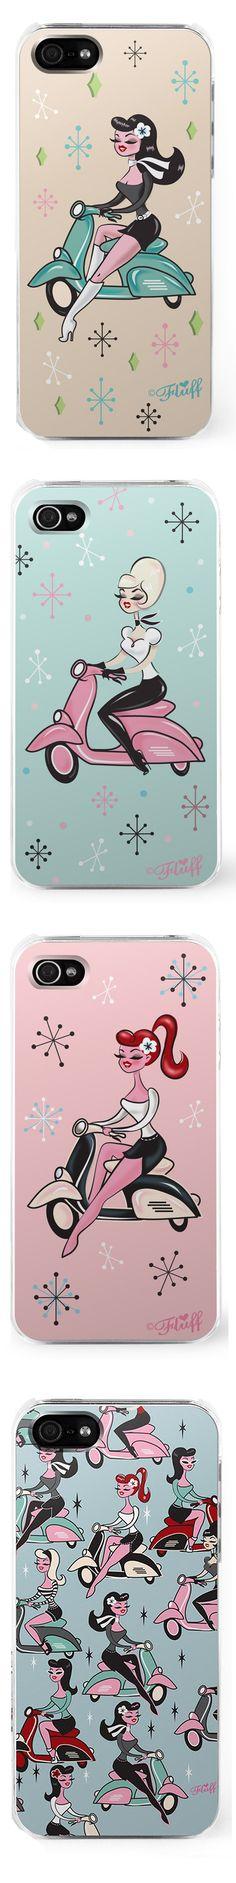 vespa iphone